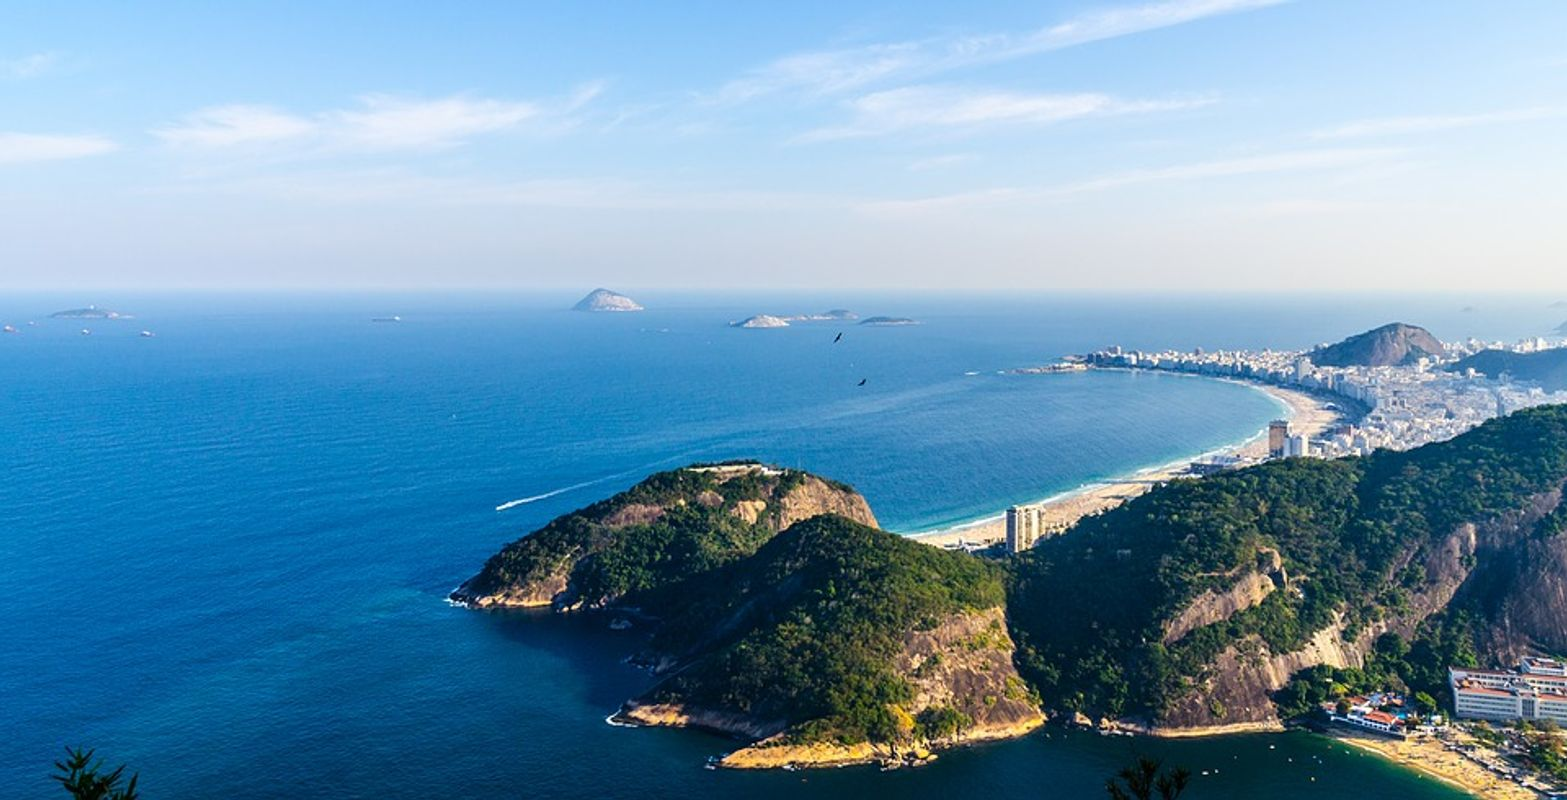 Beautiful Sugarloaf Mountain in Brazil